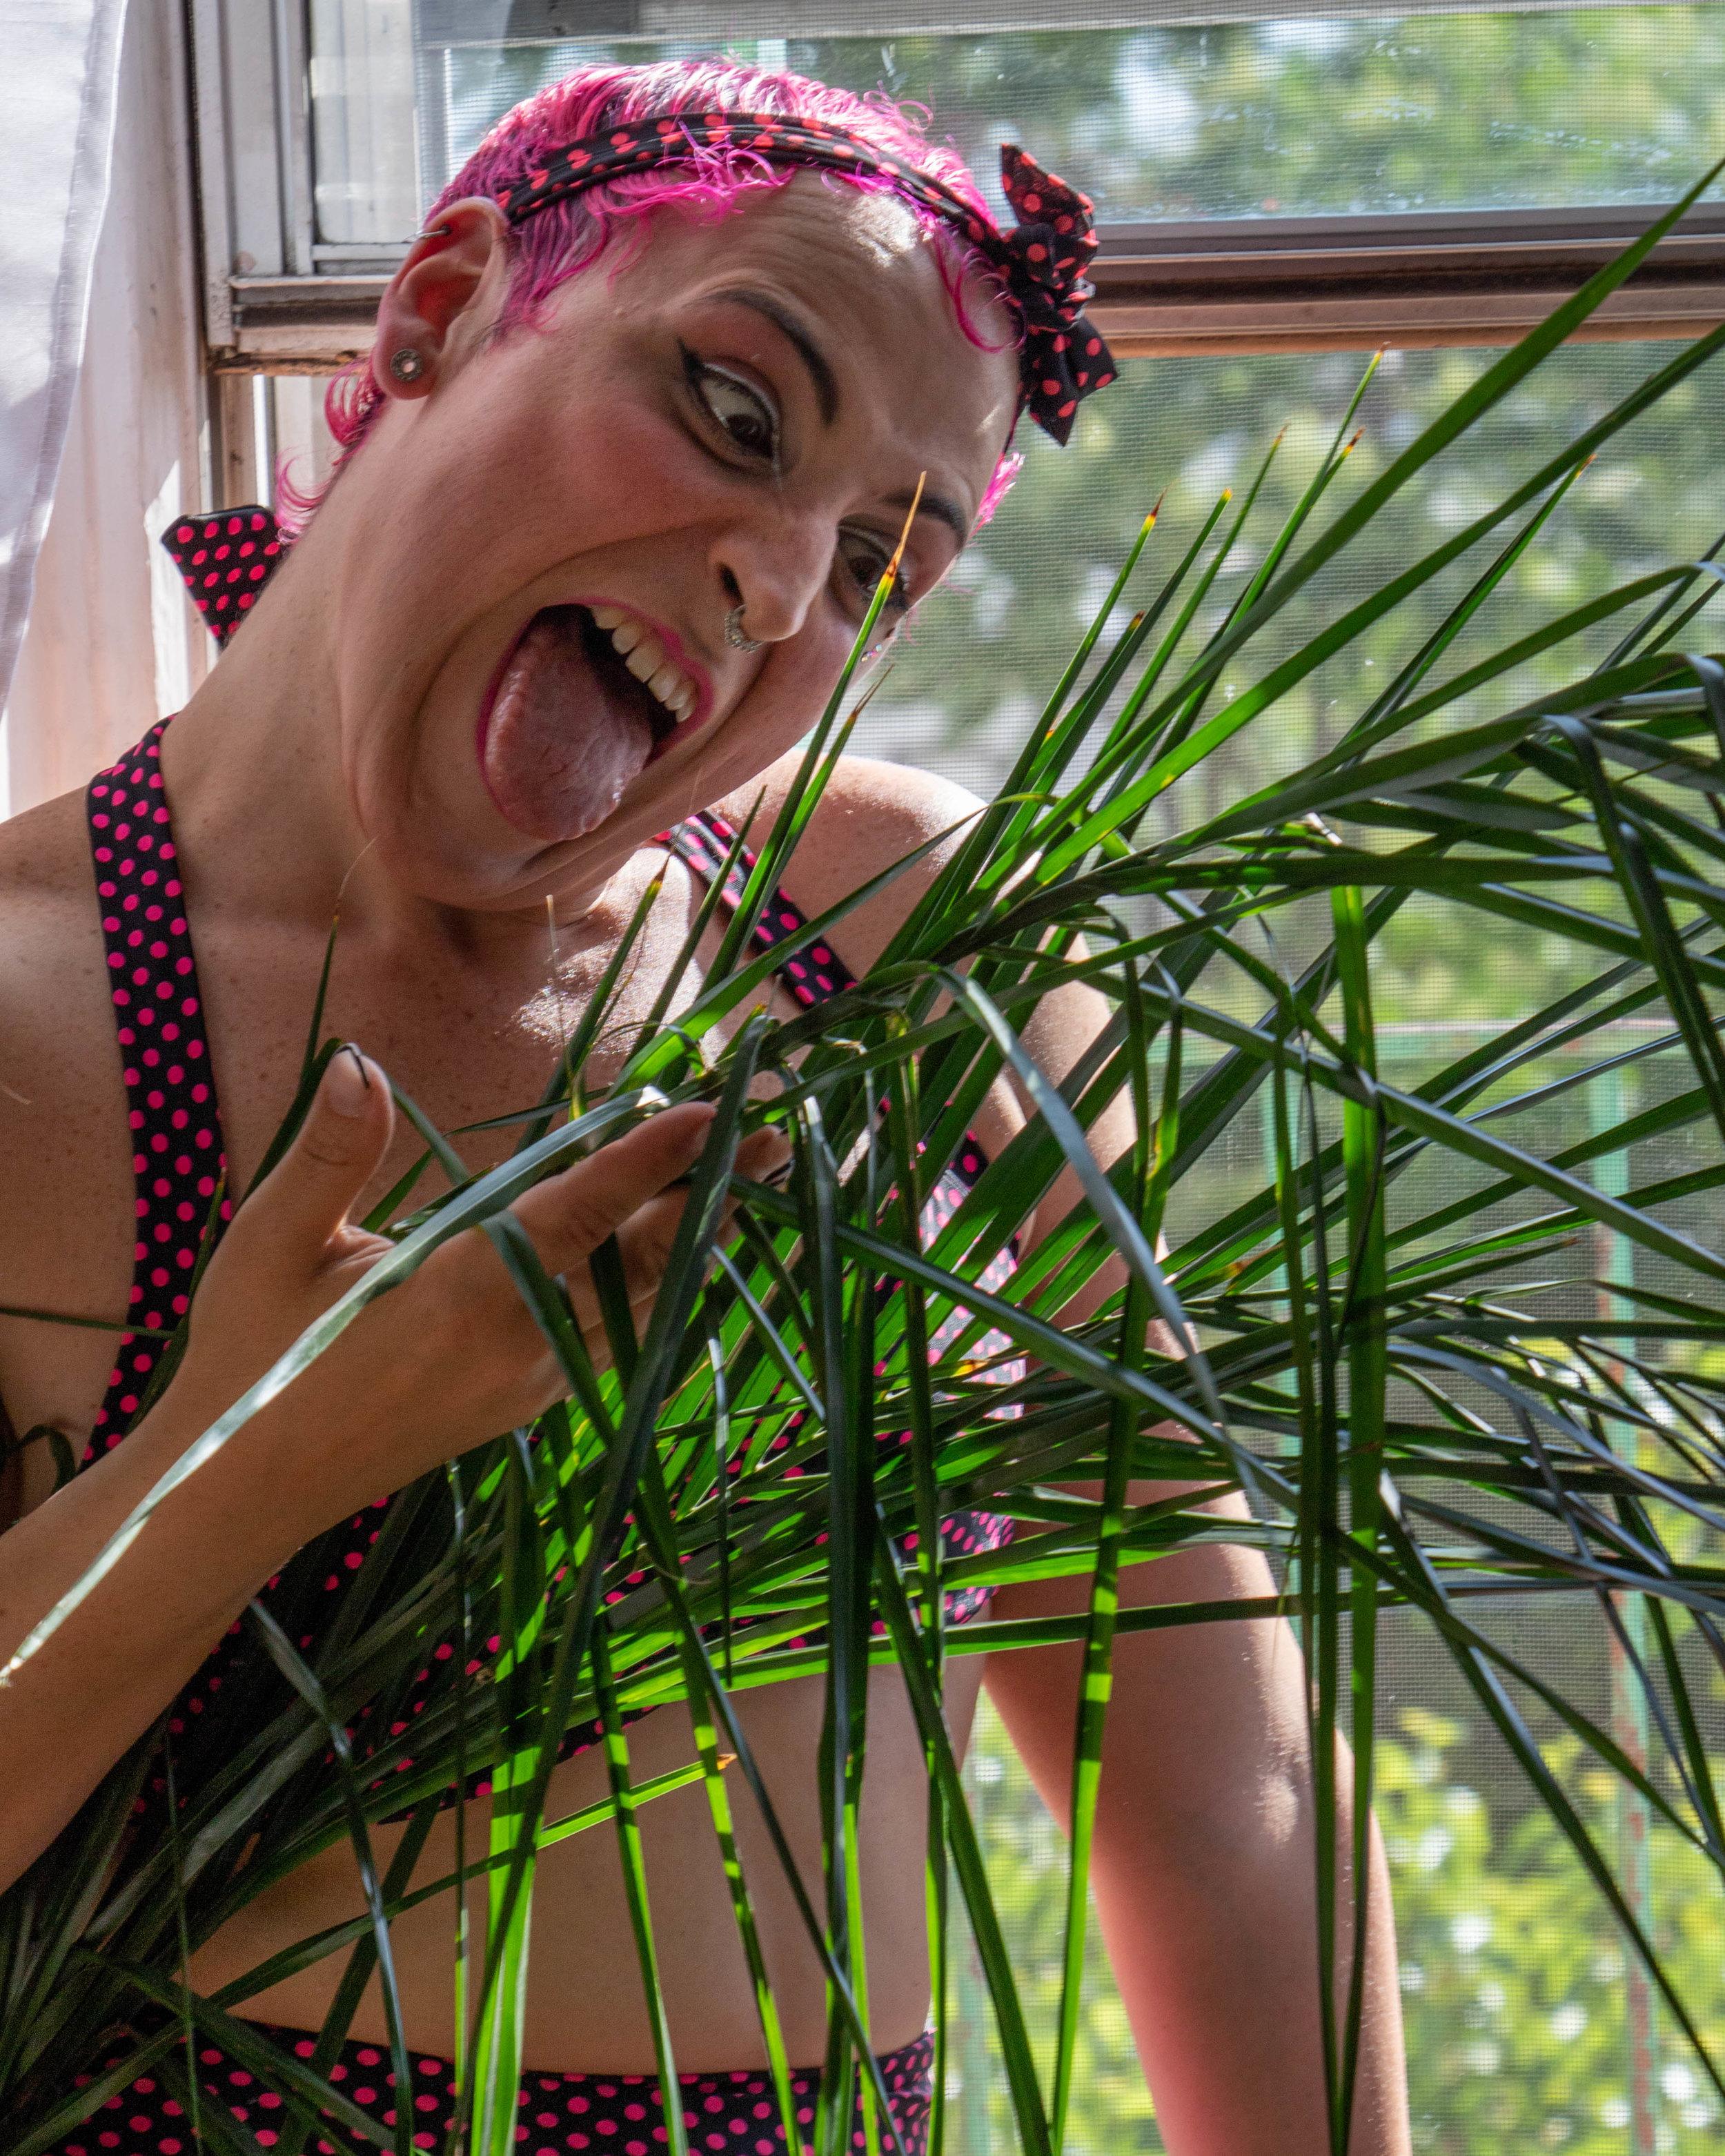 Veronica Viper-6-14-18-6379.jpg